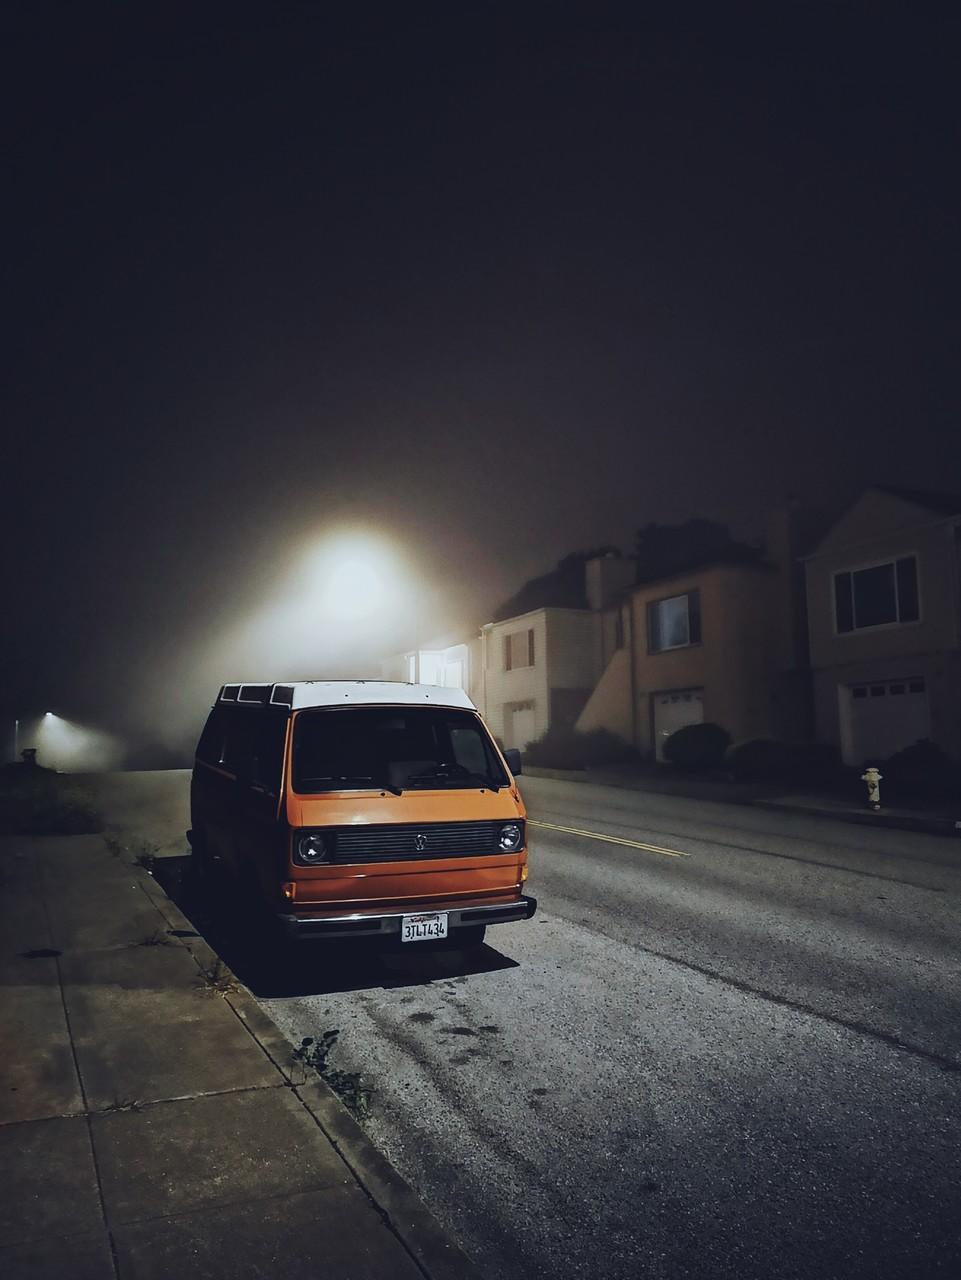 Foggy Night, © Cocu Liu, Huawei Next-Image Awards